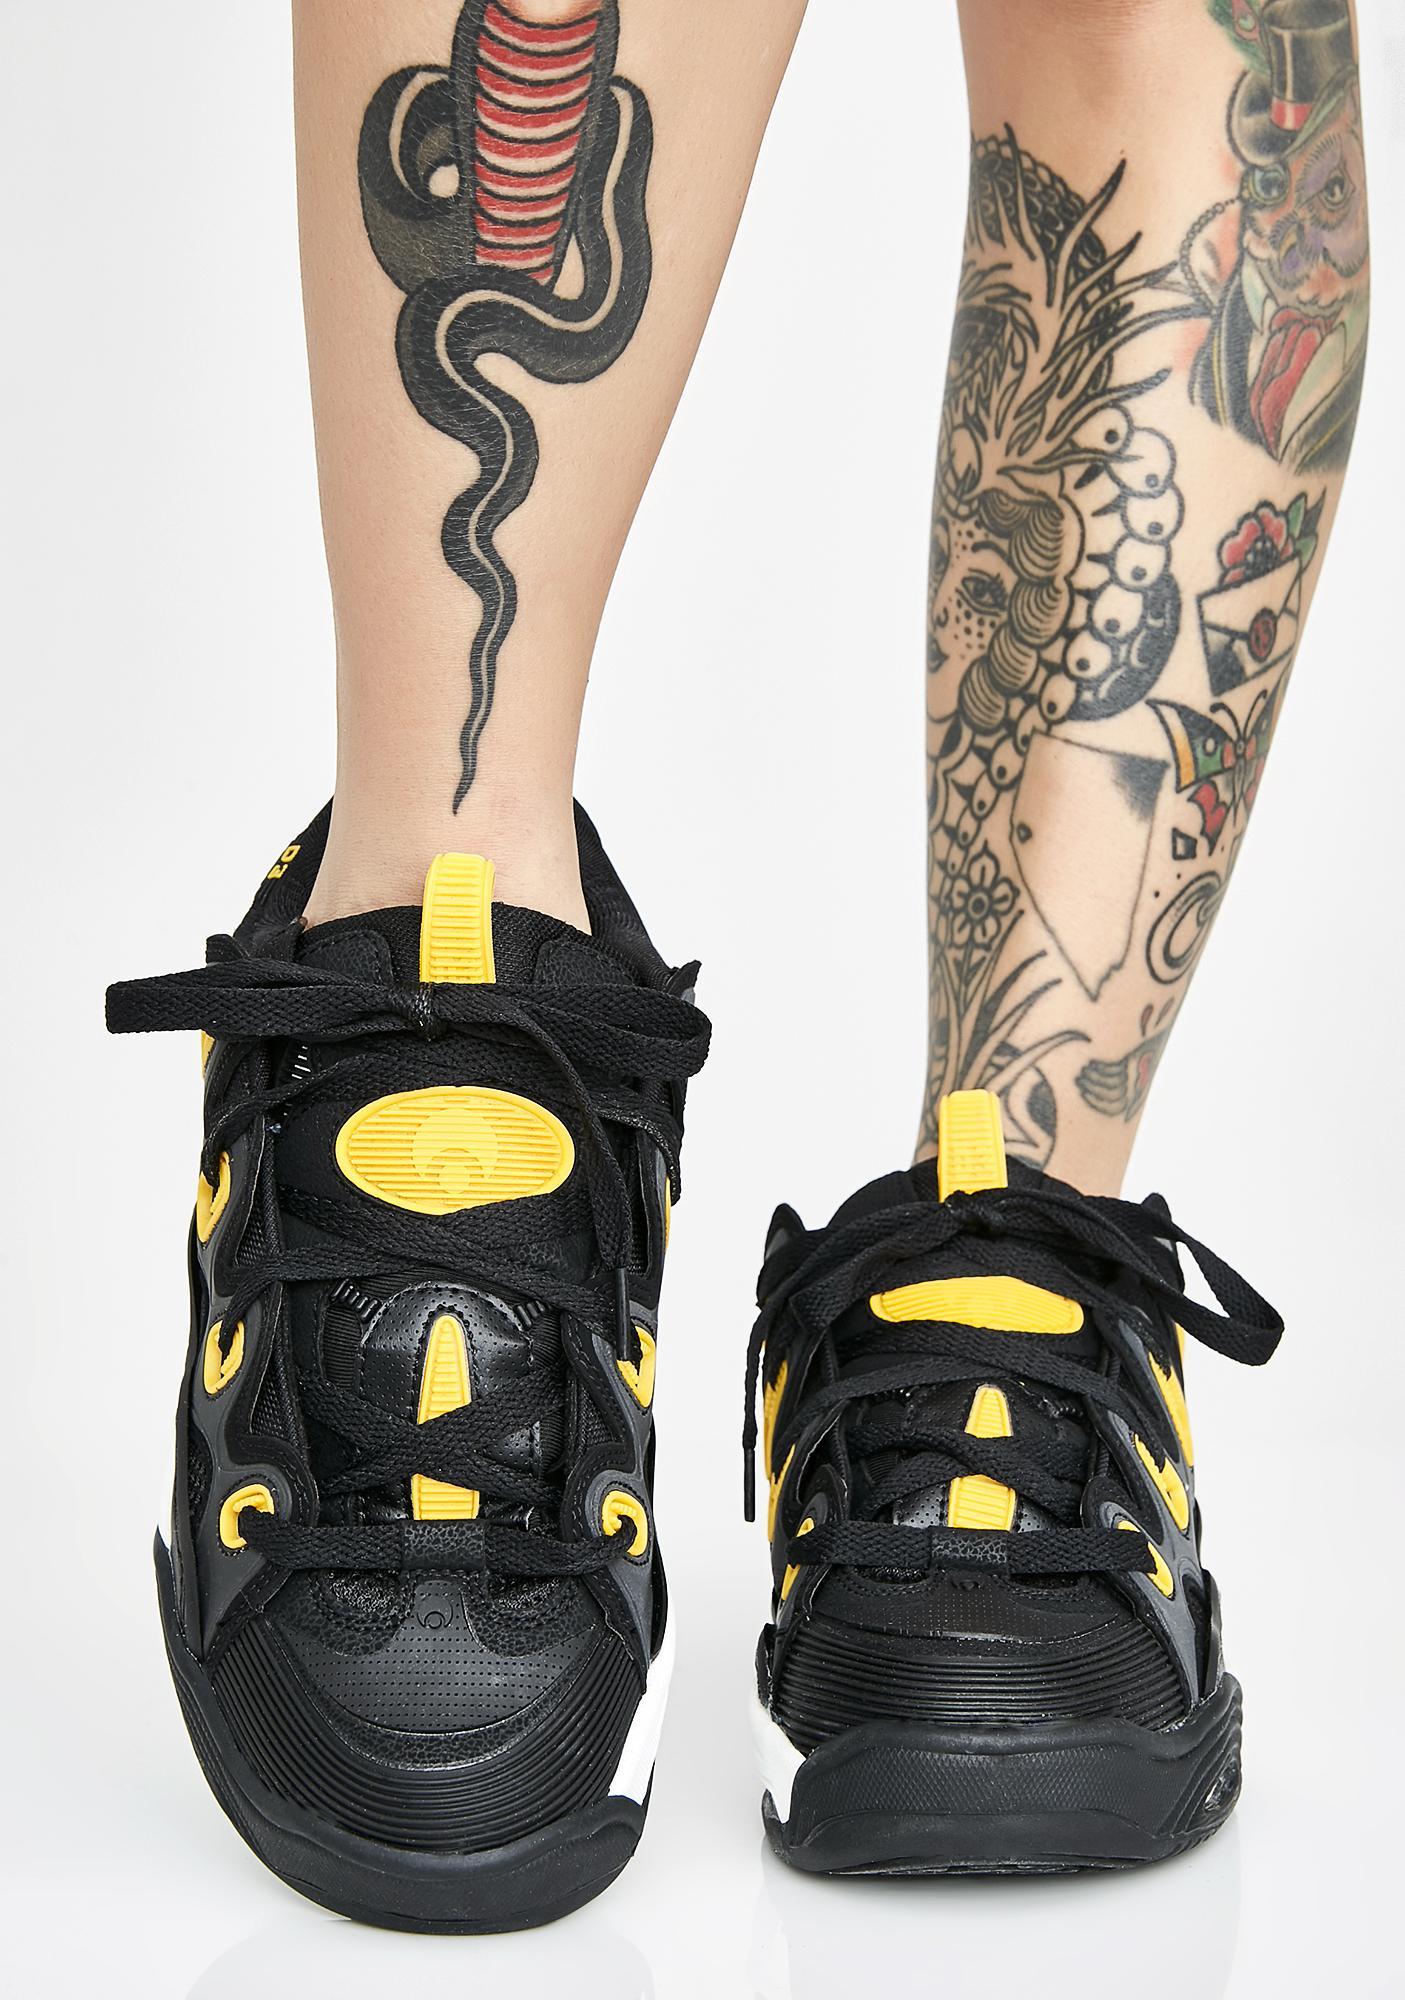 25e9af34a7a Osiris Ink D3 2001 Chunky Sneakers | Dolls Kill